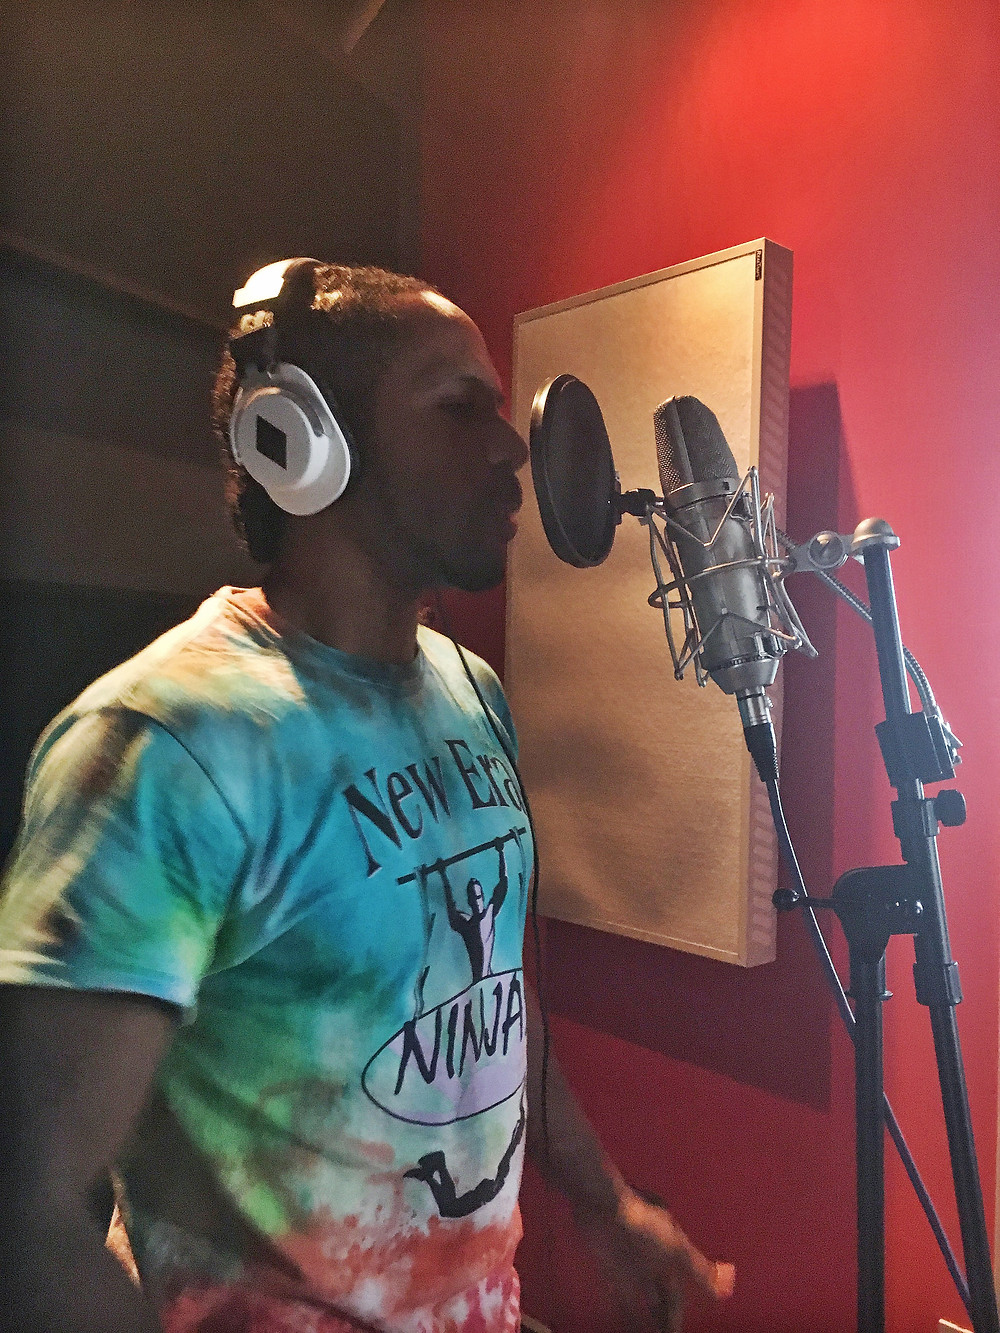 Black Jewelz now recording at Sage Sound Studios